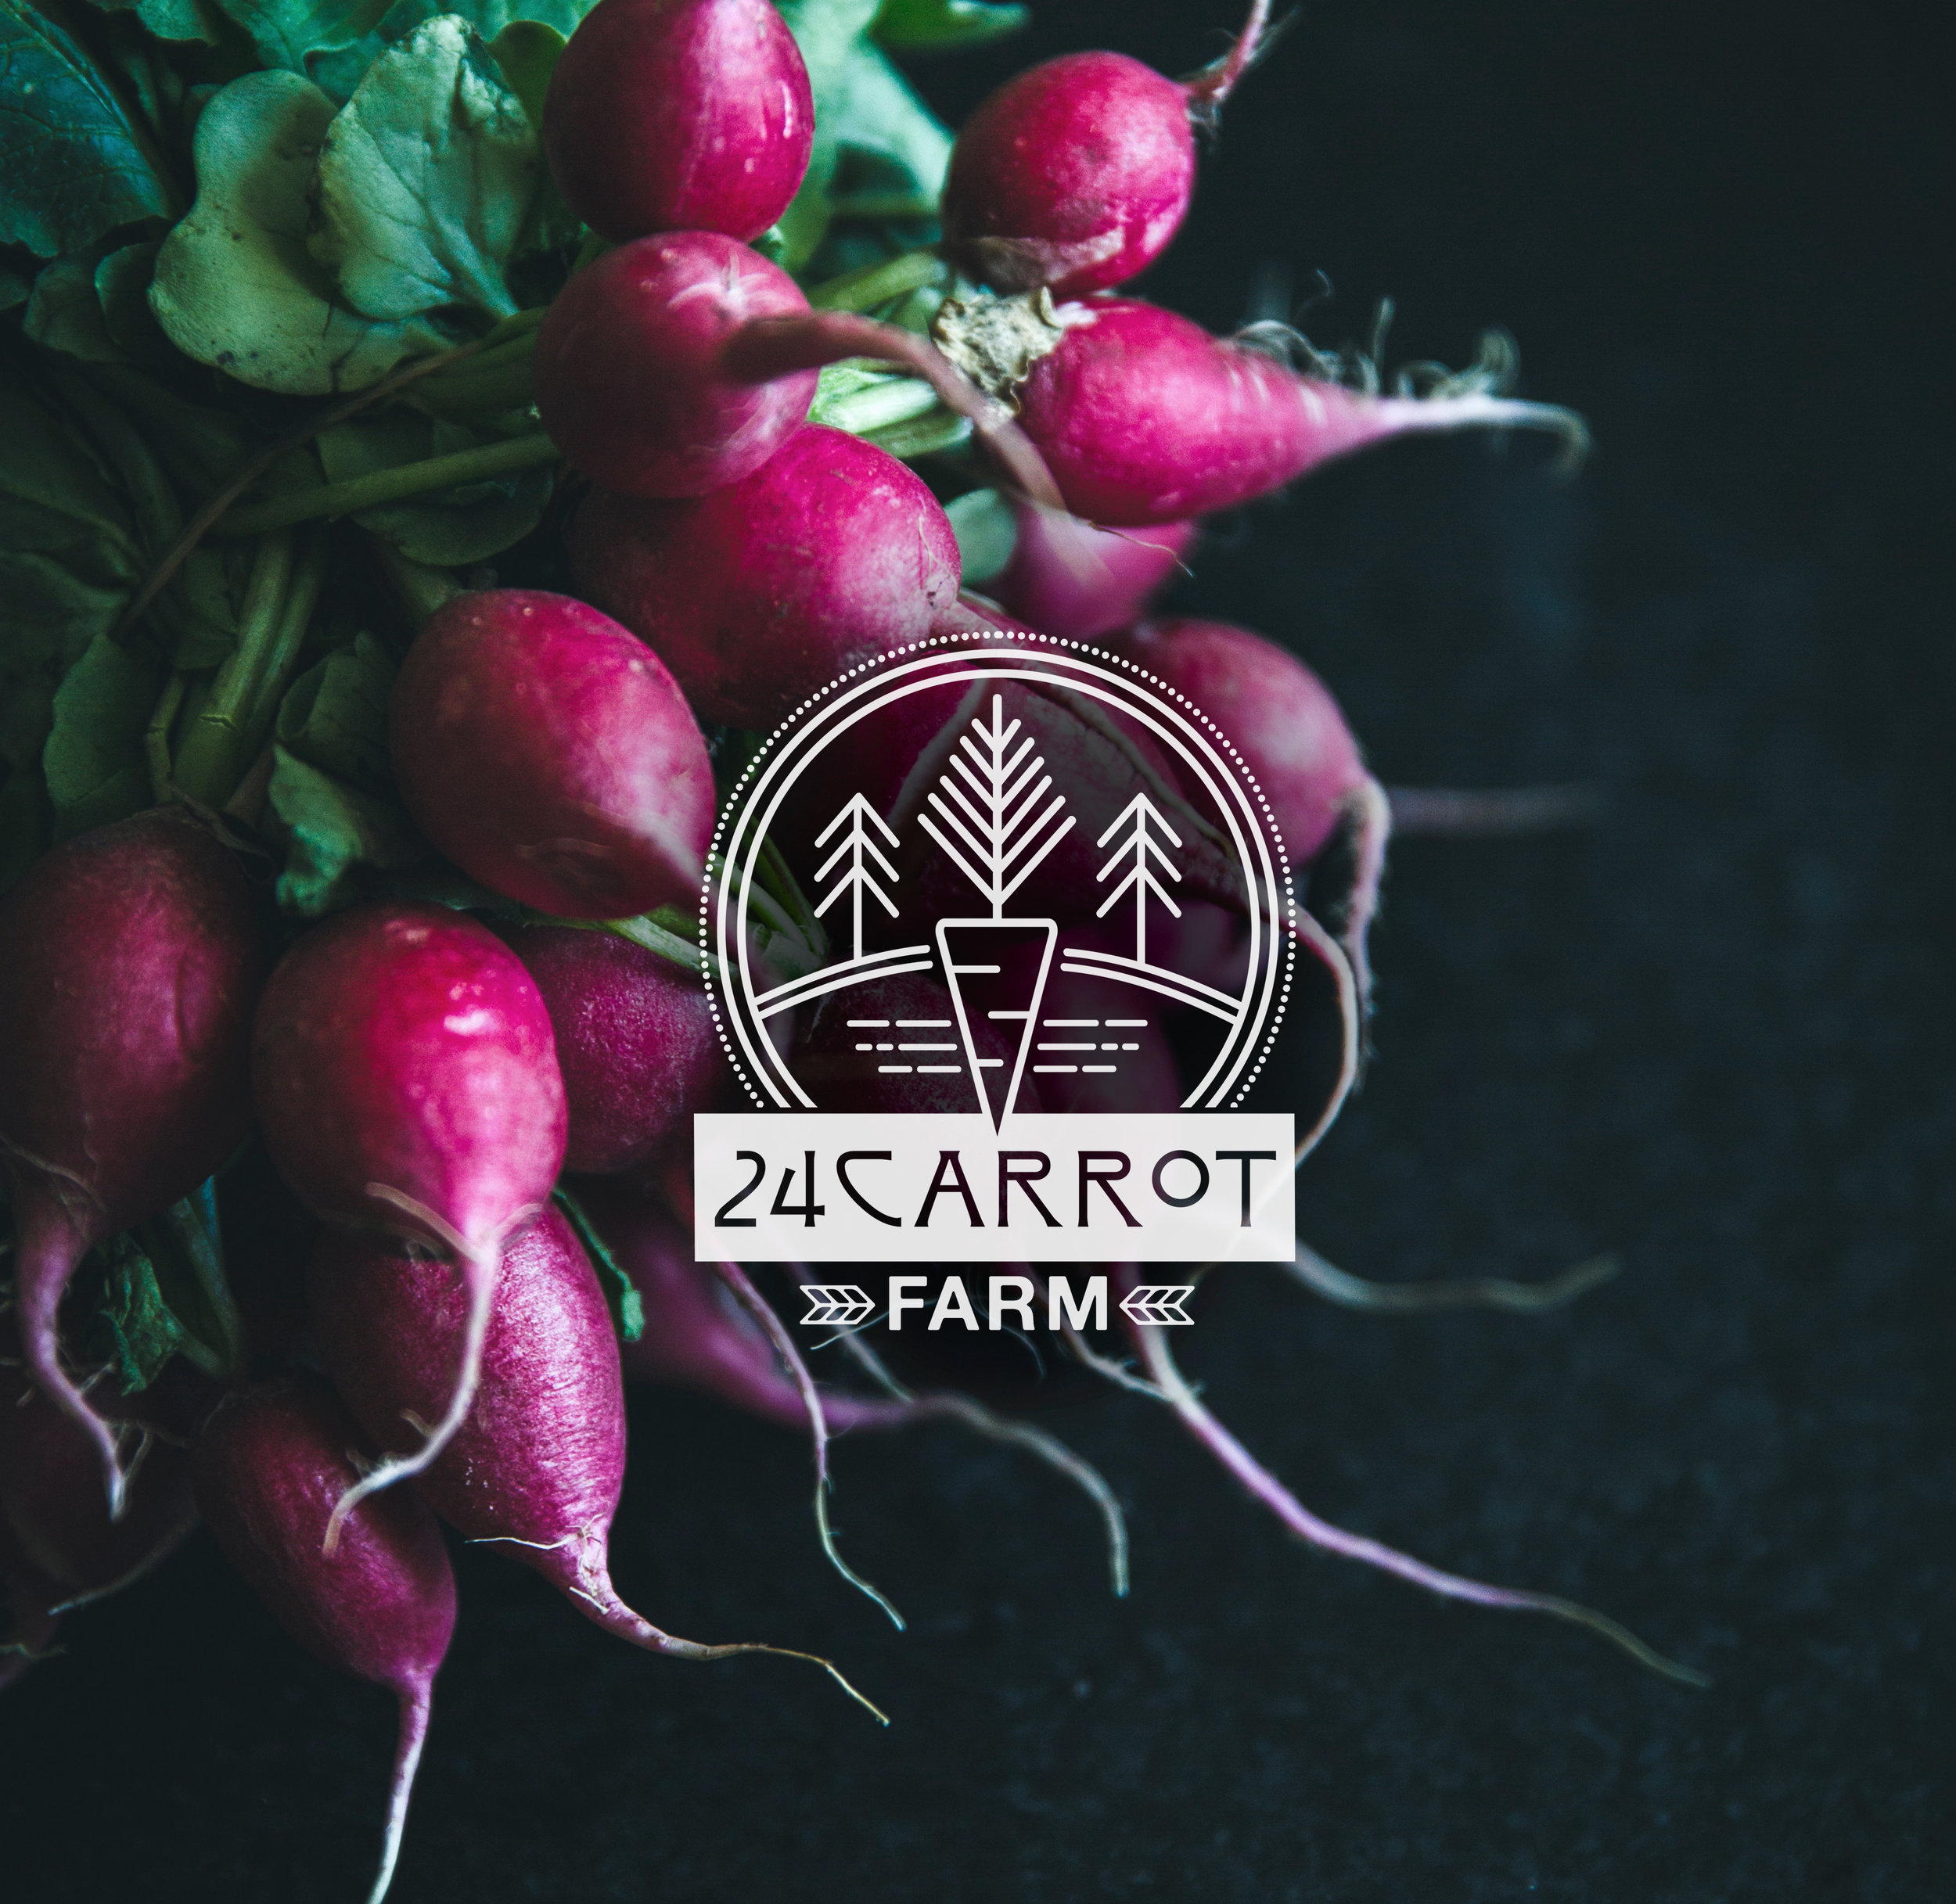 24carrotPortfolio.jpg